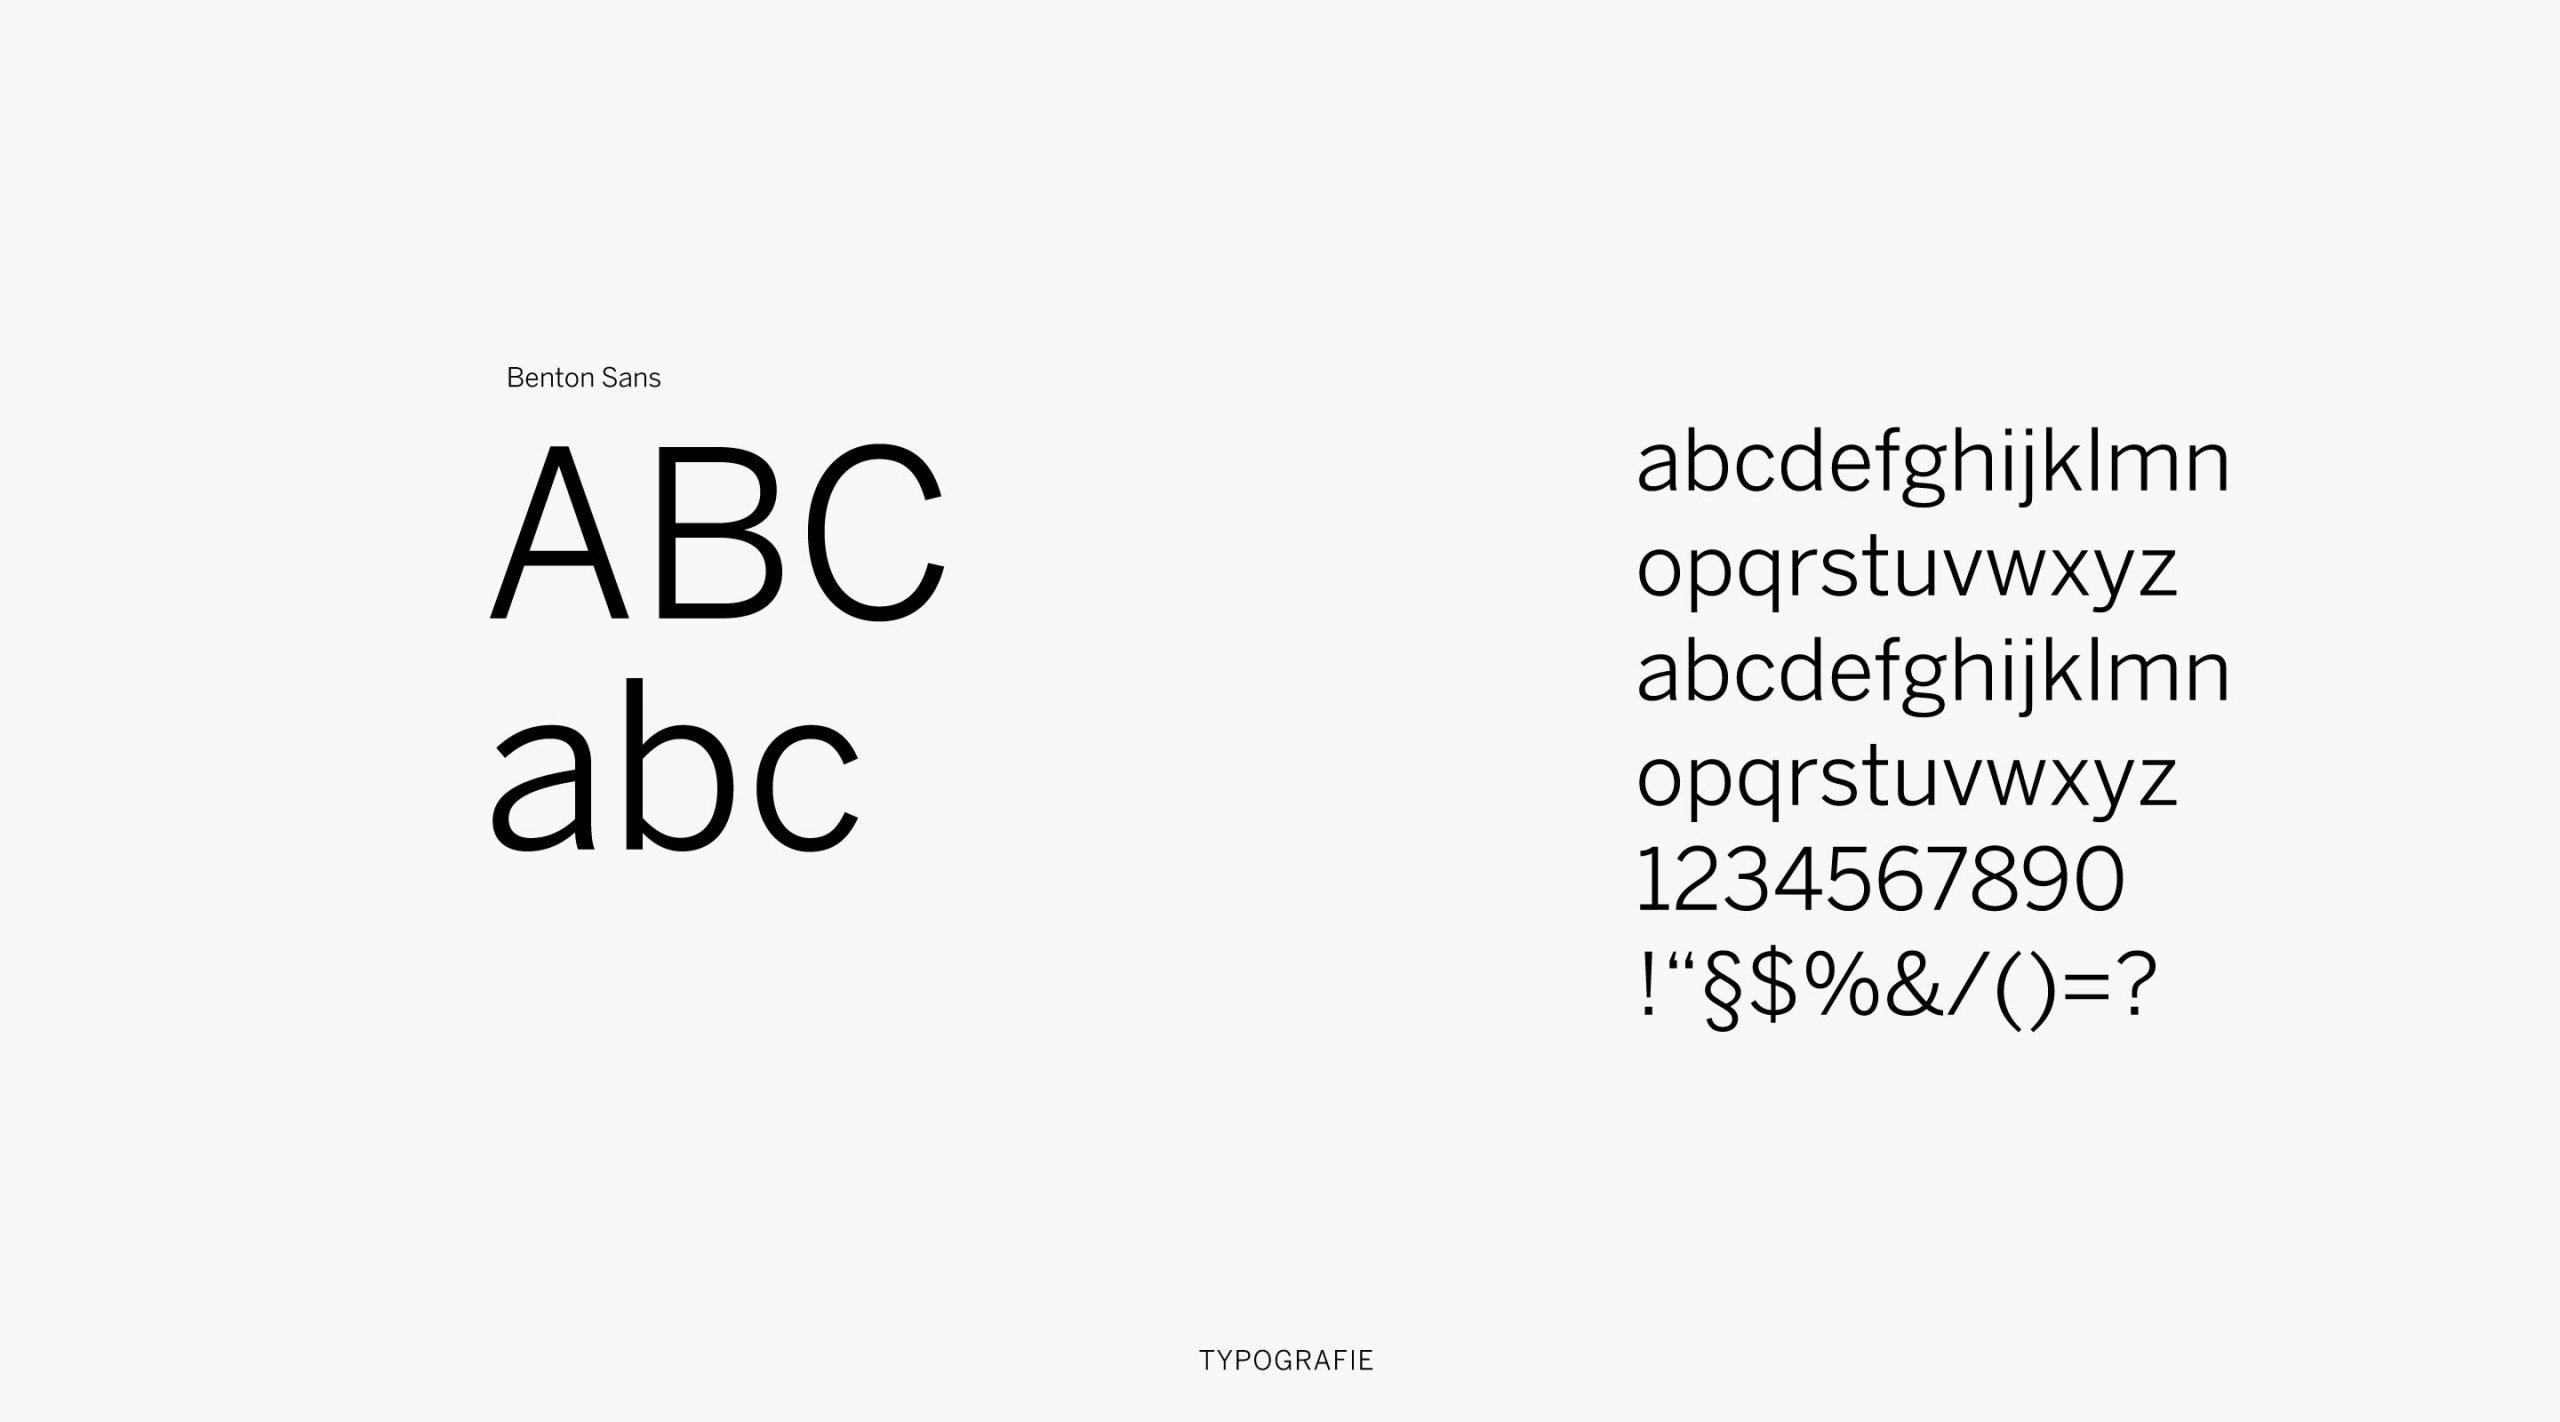 Marcel Tilmann Branding Typografie – Uthmöller und Partner